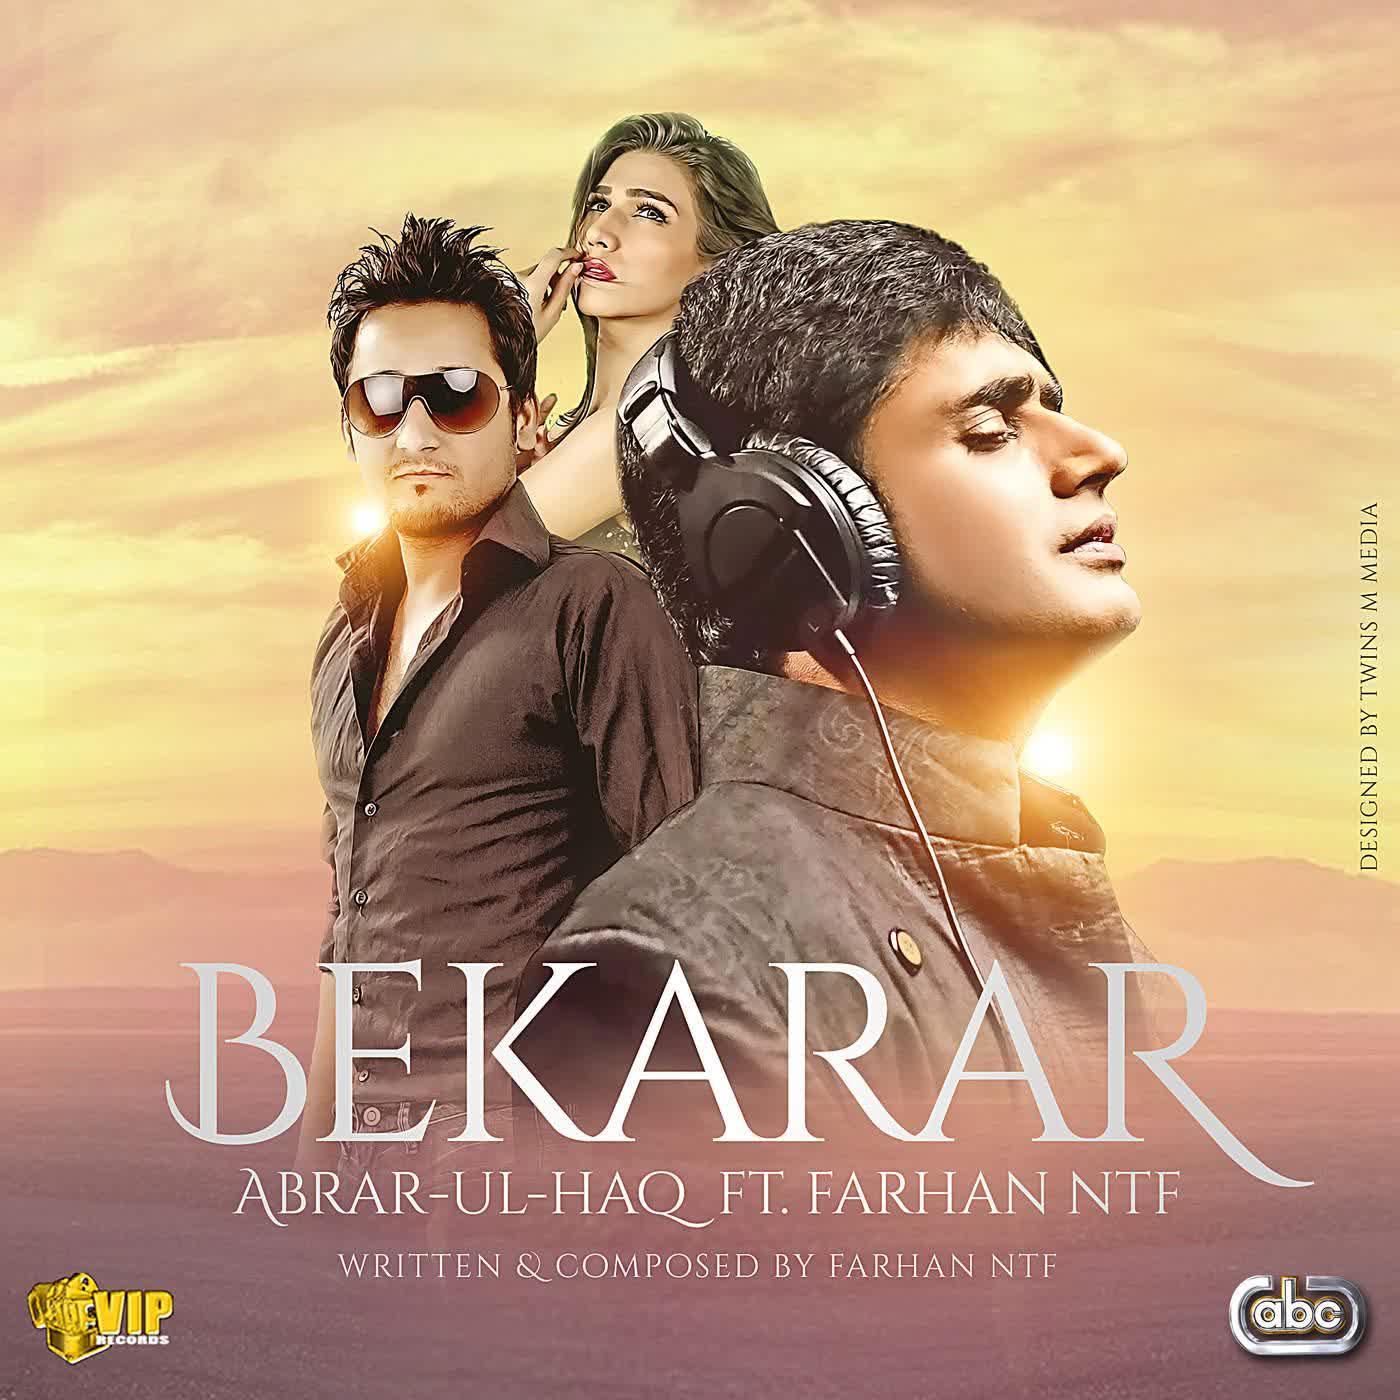 Bekarar Abrar Ul Haq  Mp3 song download